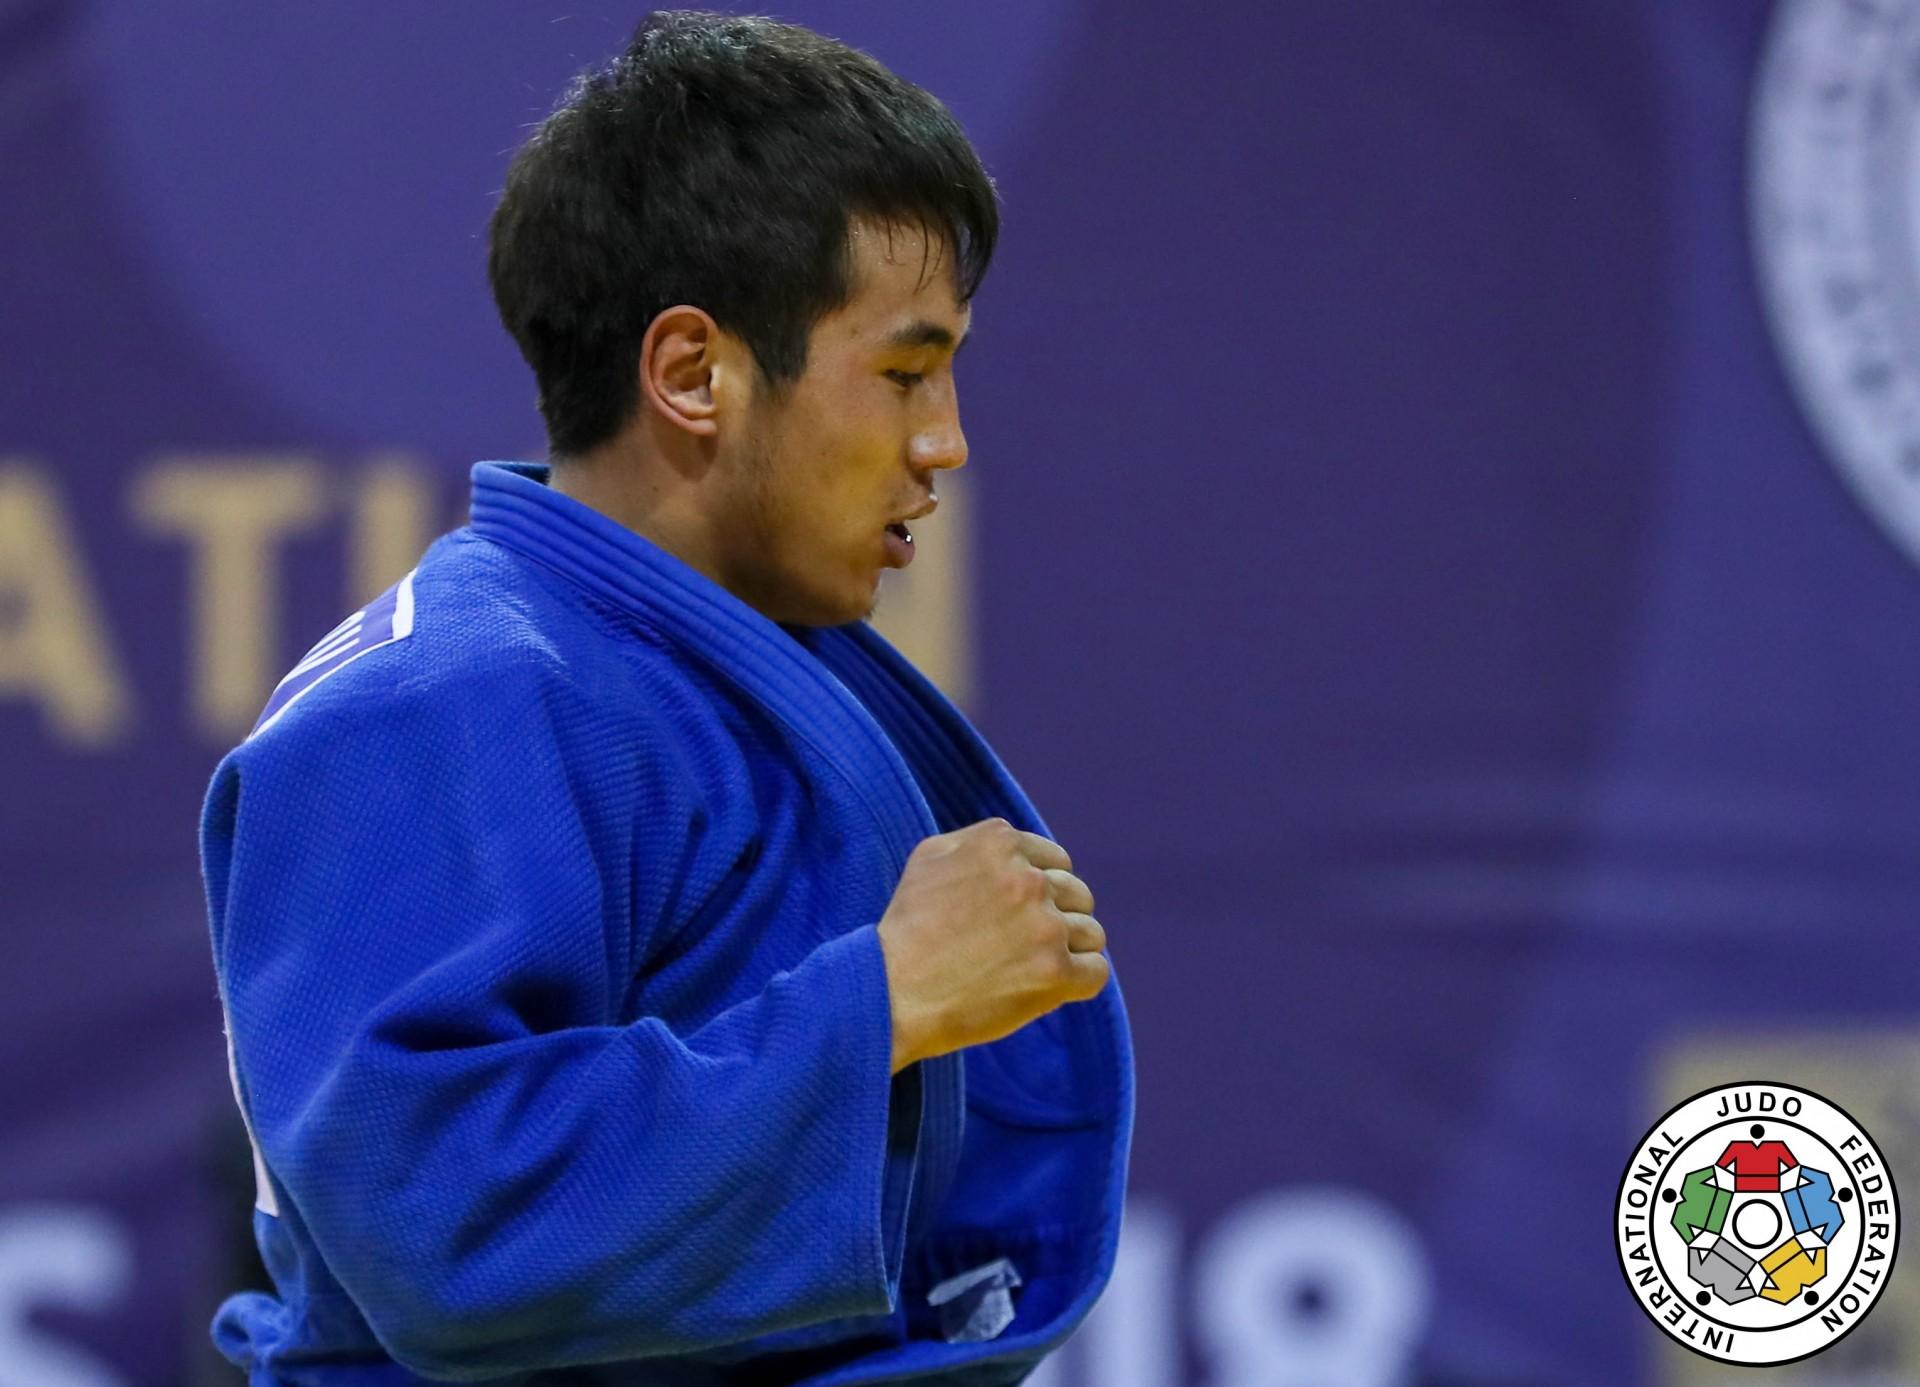 Ерлан Серикжанов завоевал серебряную медаль на ЧМ в Баку